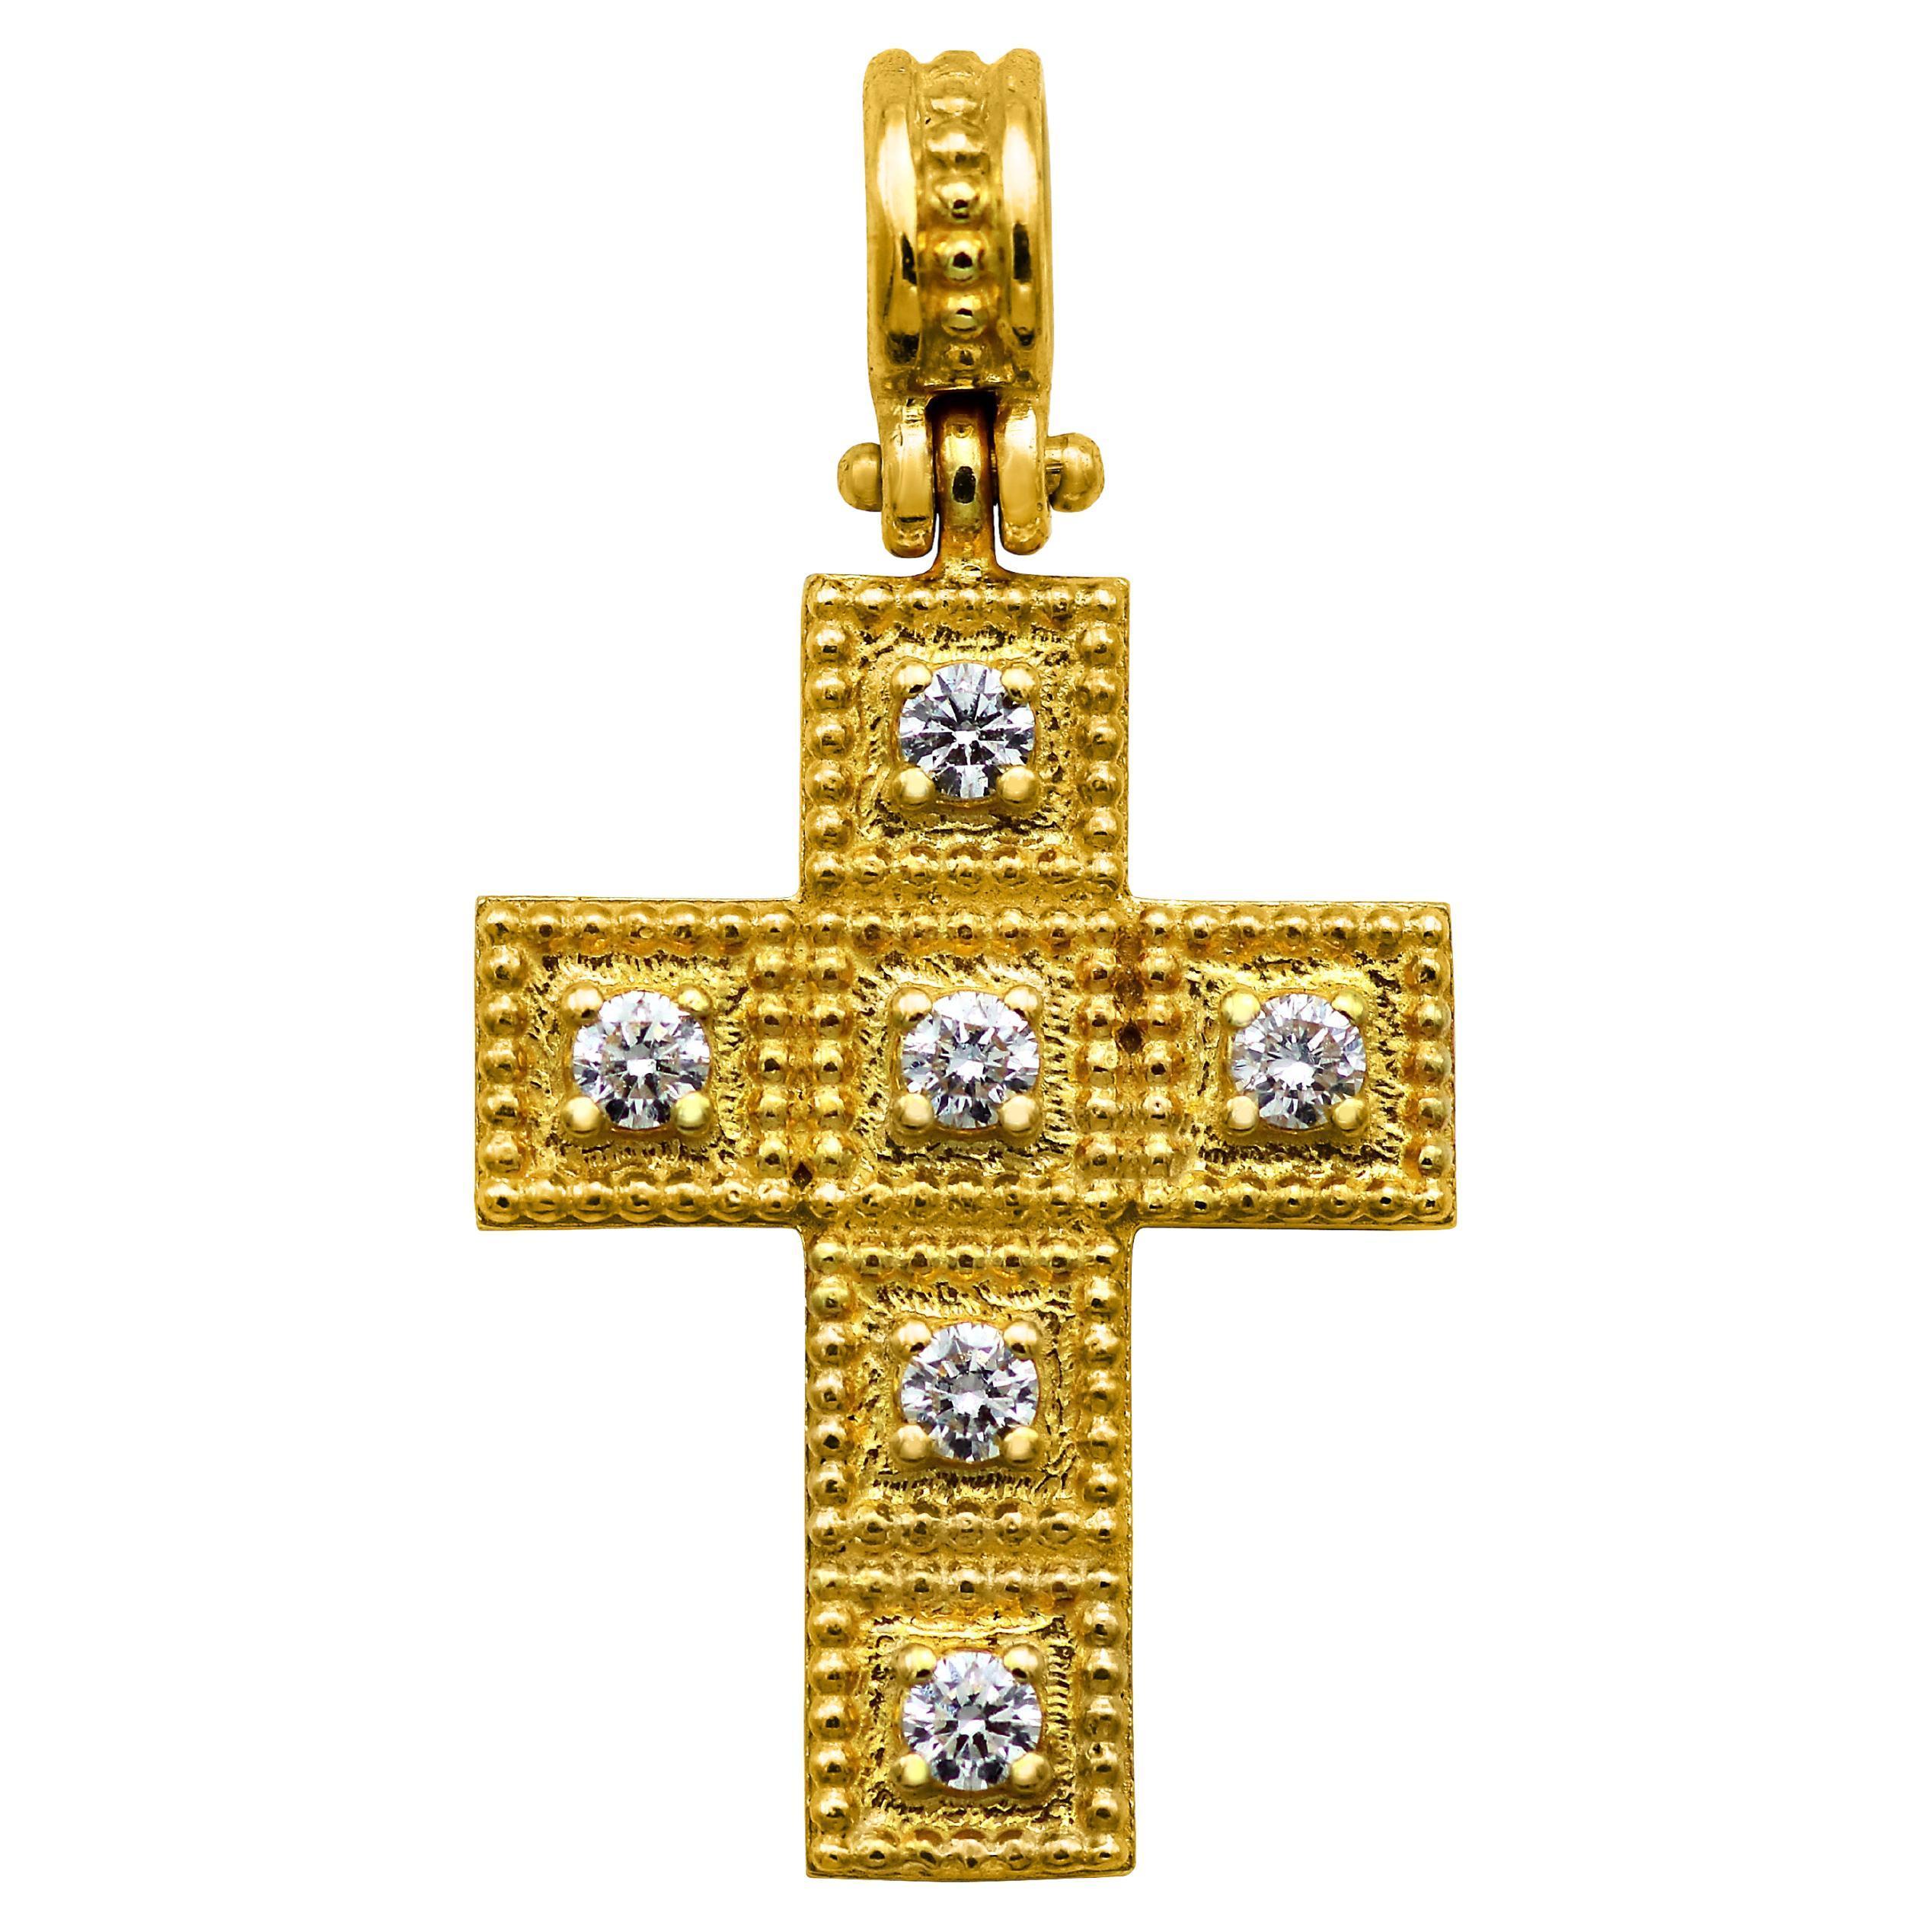 Dimos 18k Gold Cross Pendant with Diamonds